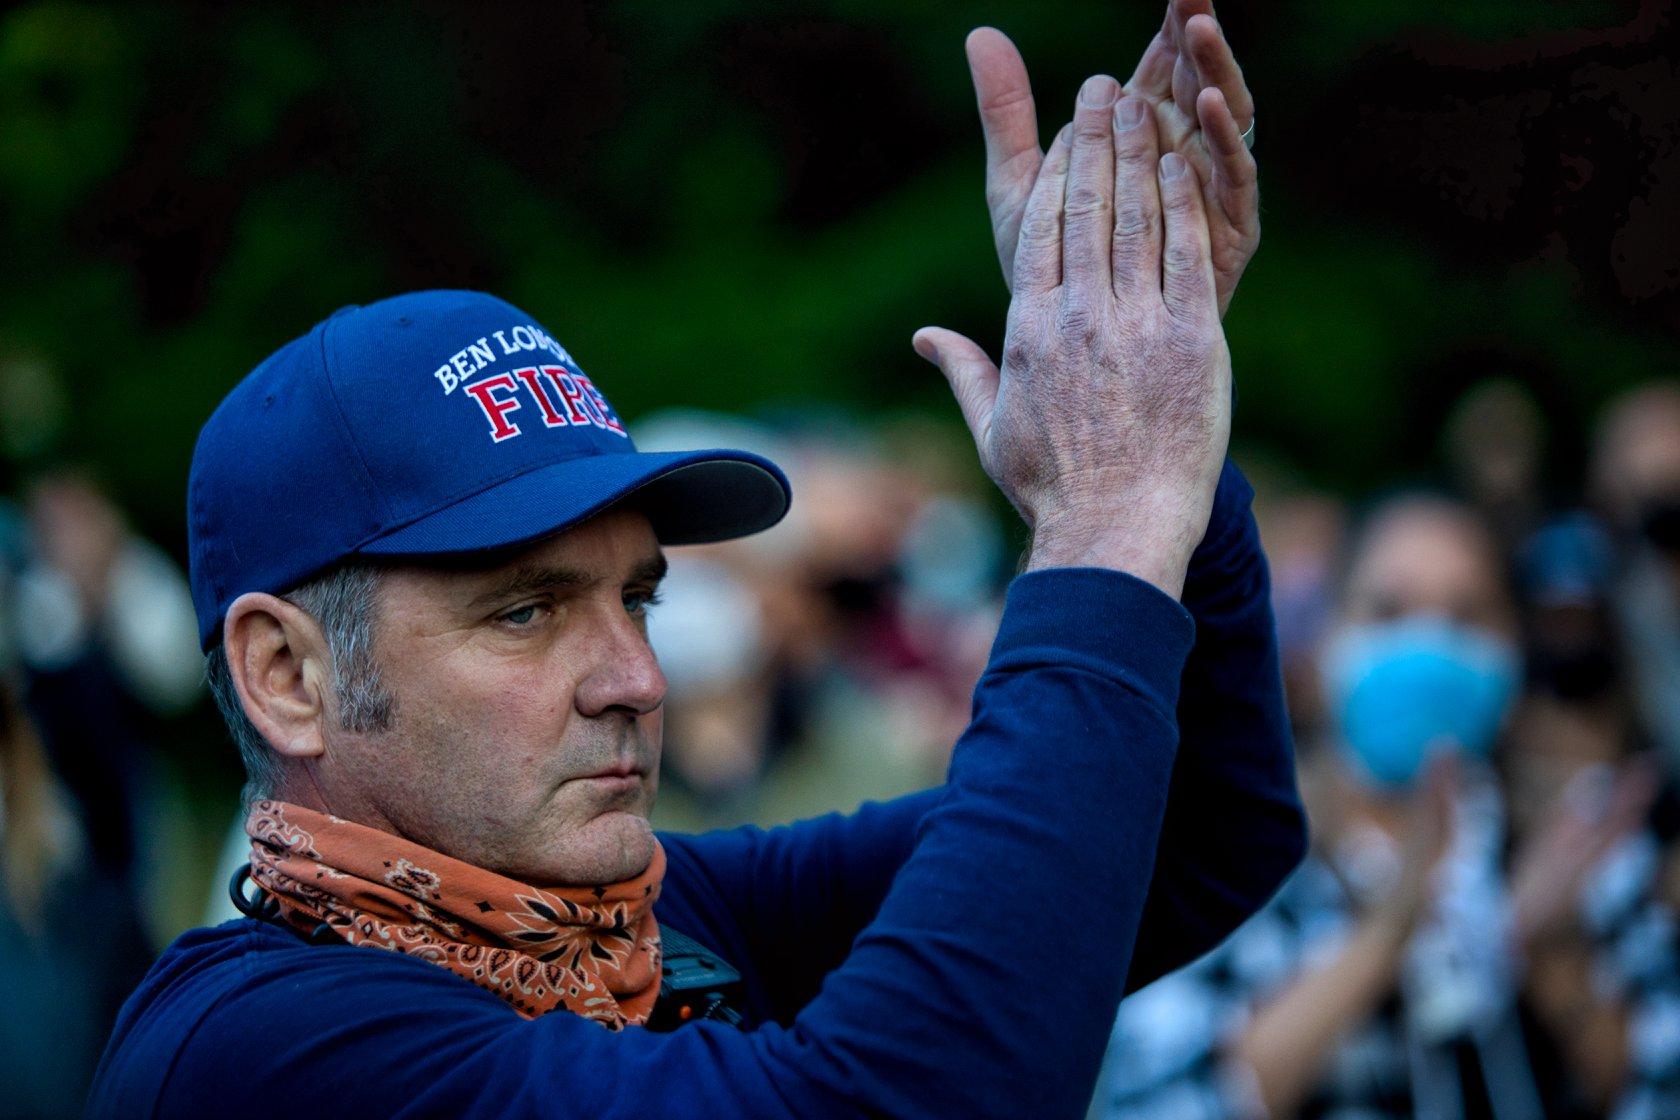 Kevin Painchaud Ben Lomond Vigil